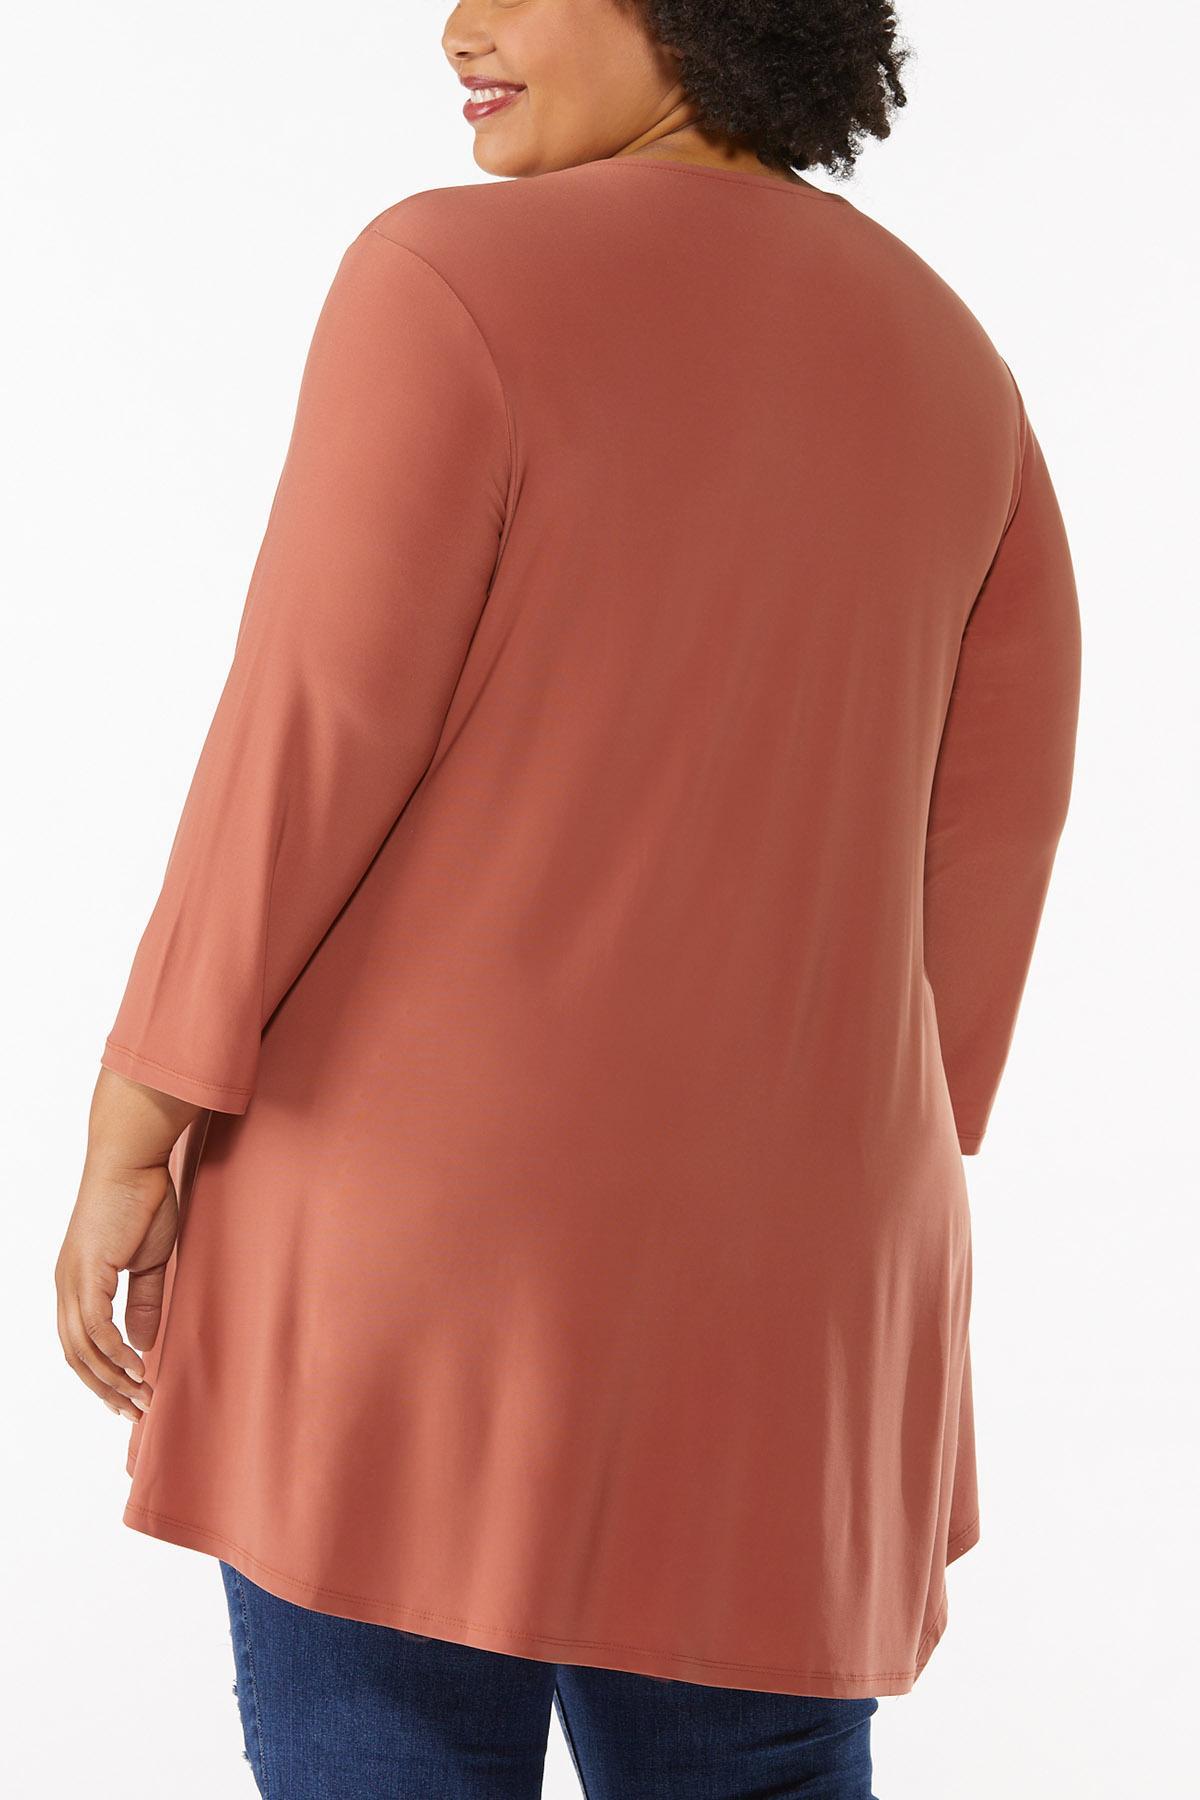 Plus Size Solid Asymmetrical Tunic (Item #44675863)